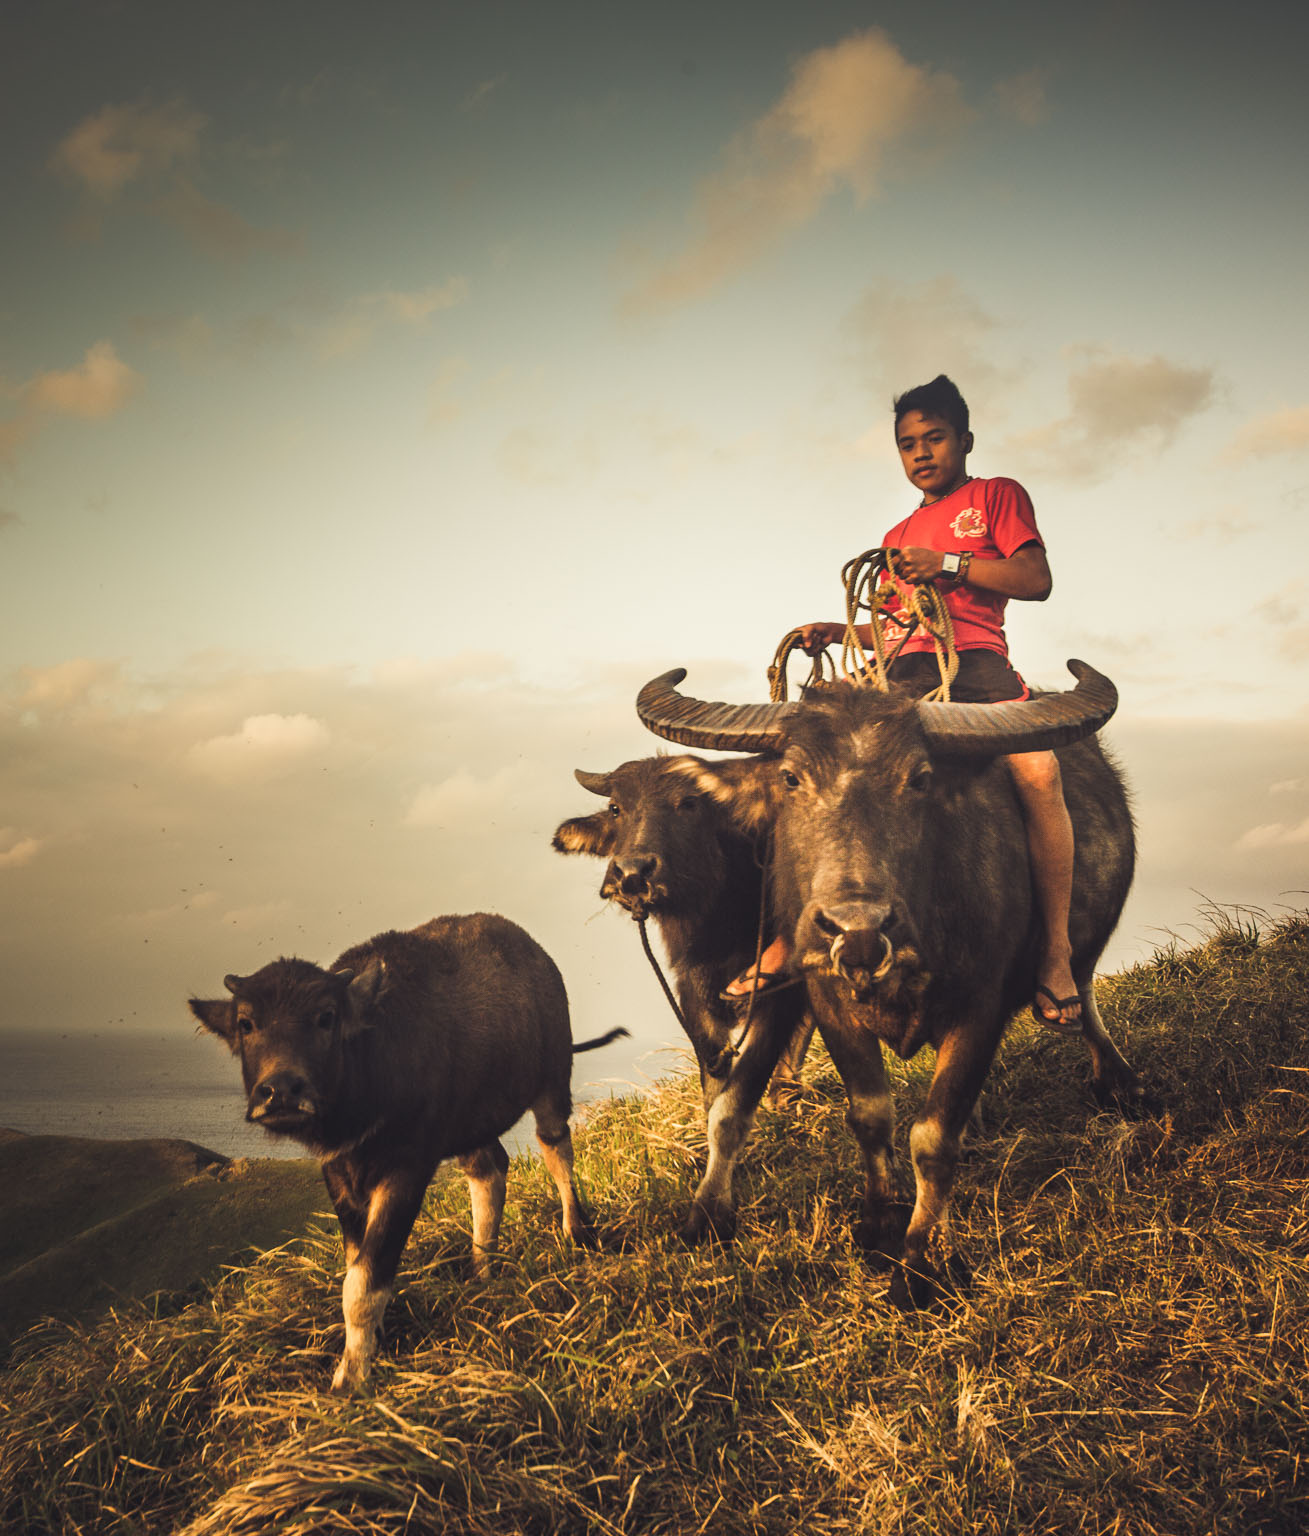 Racuh A Payaman (Marlboro Hills)